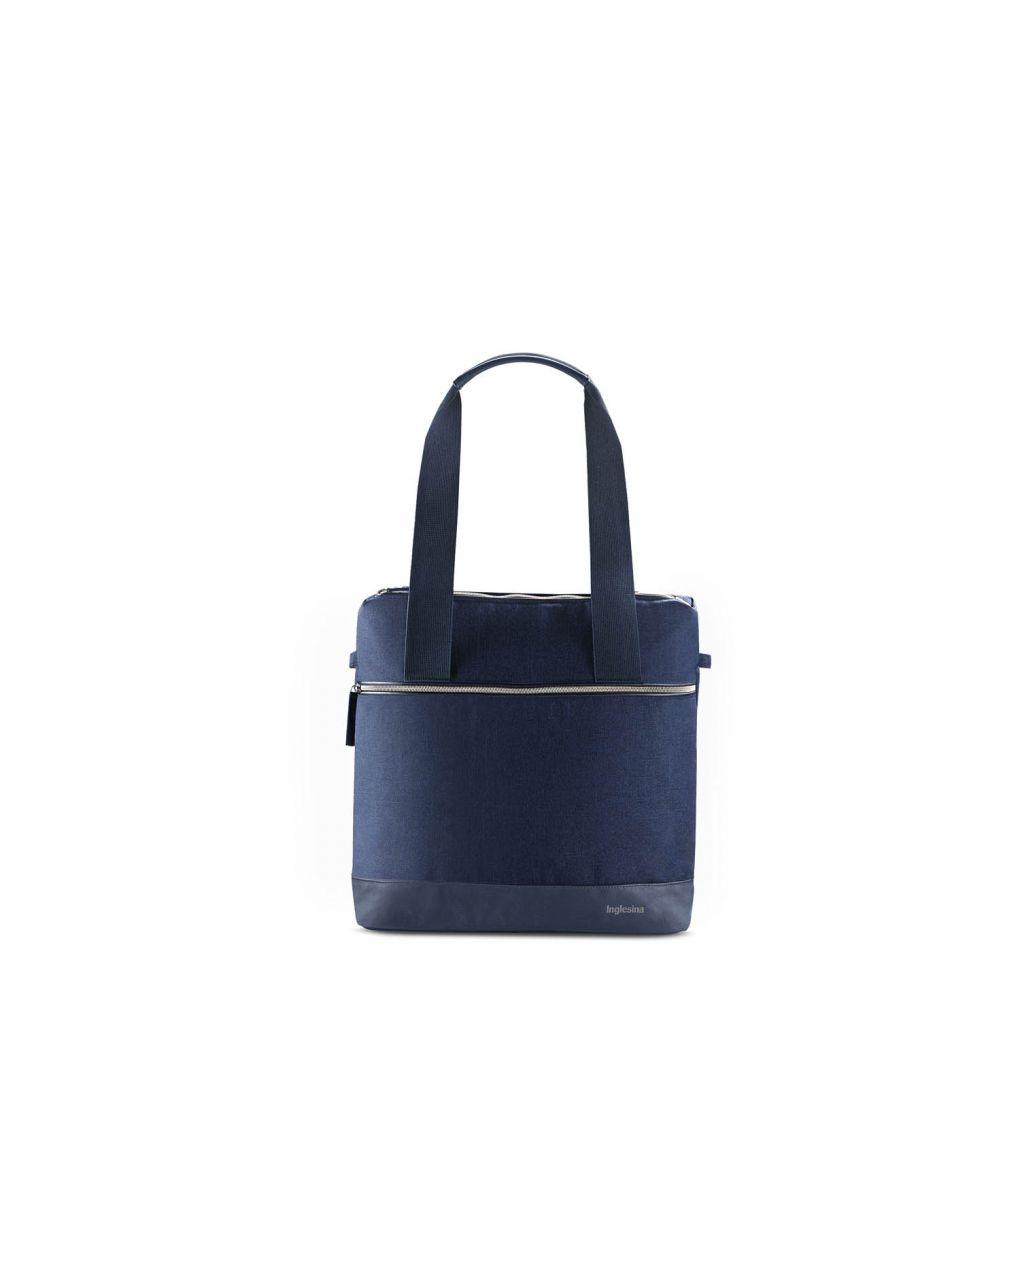 Inglesina aptica back bag, portland blue - Inglesina